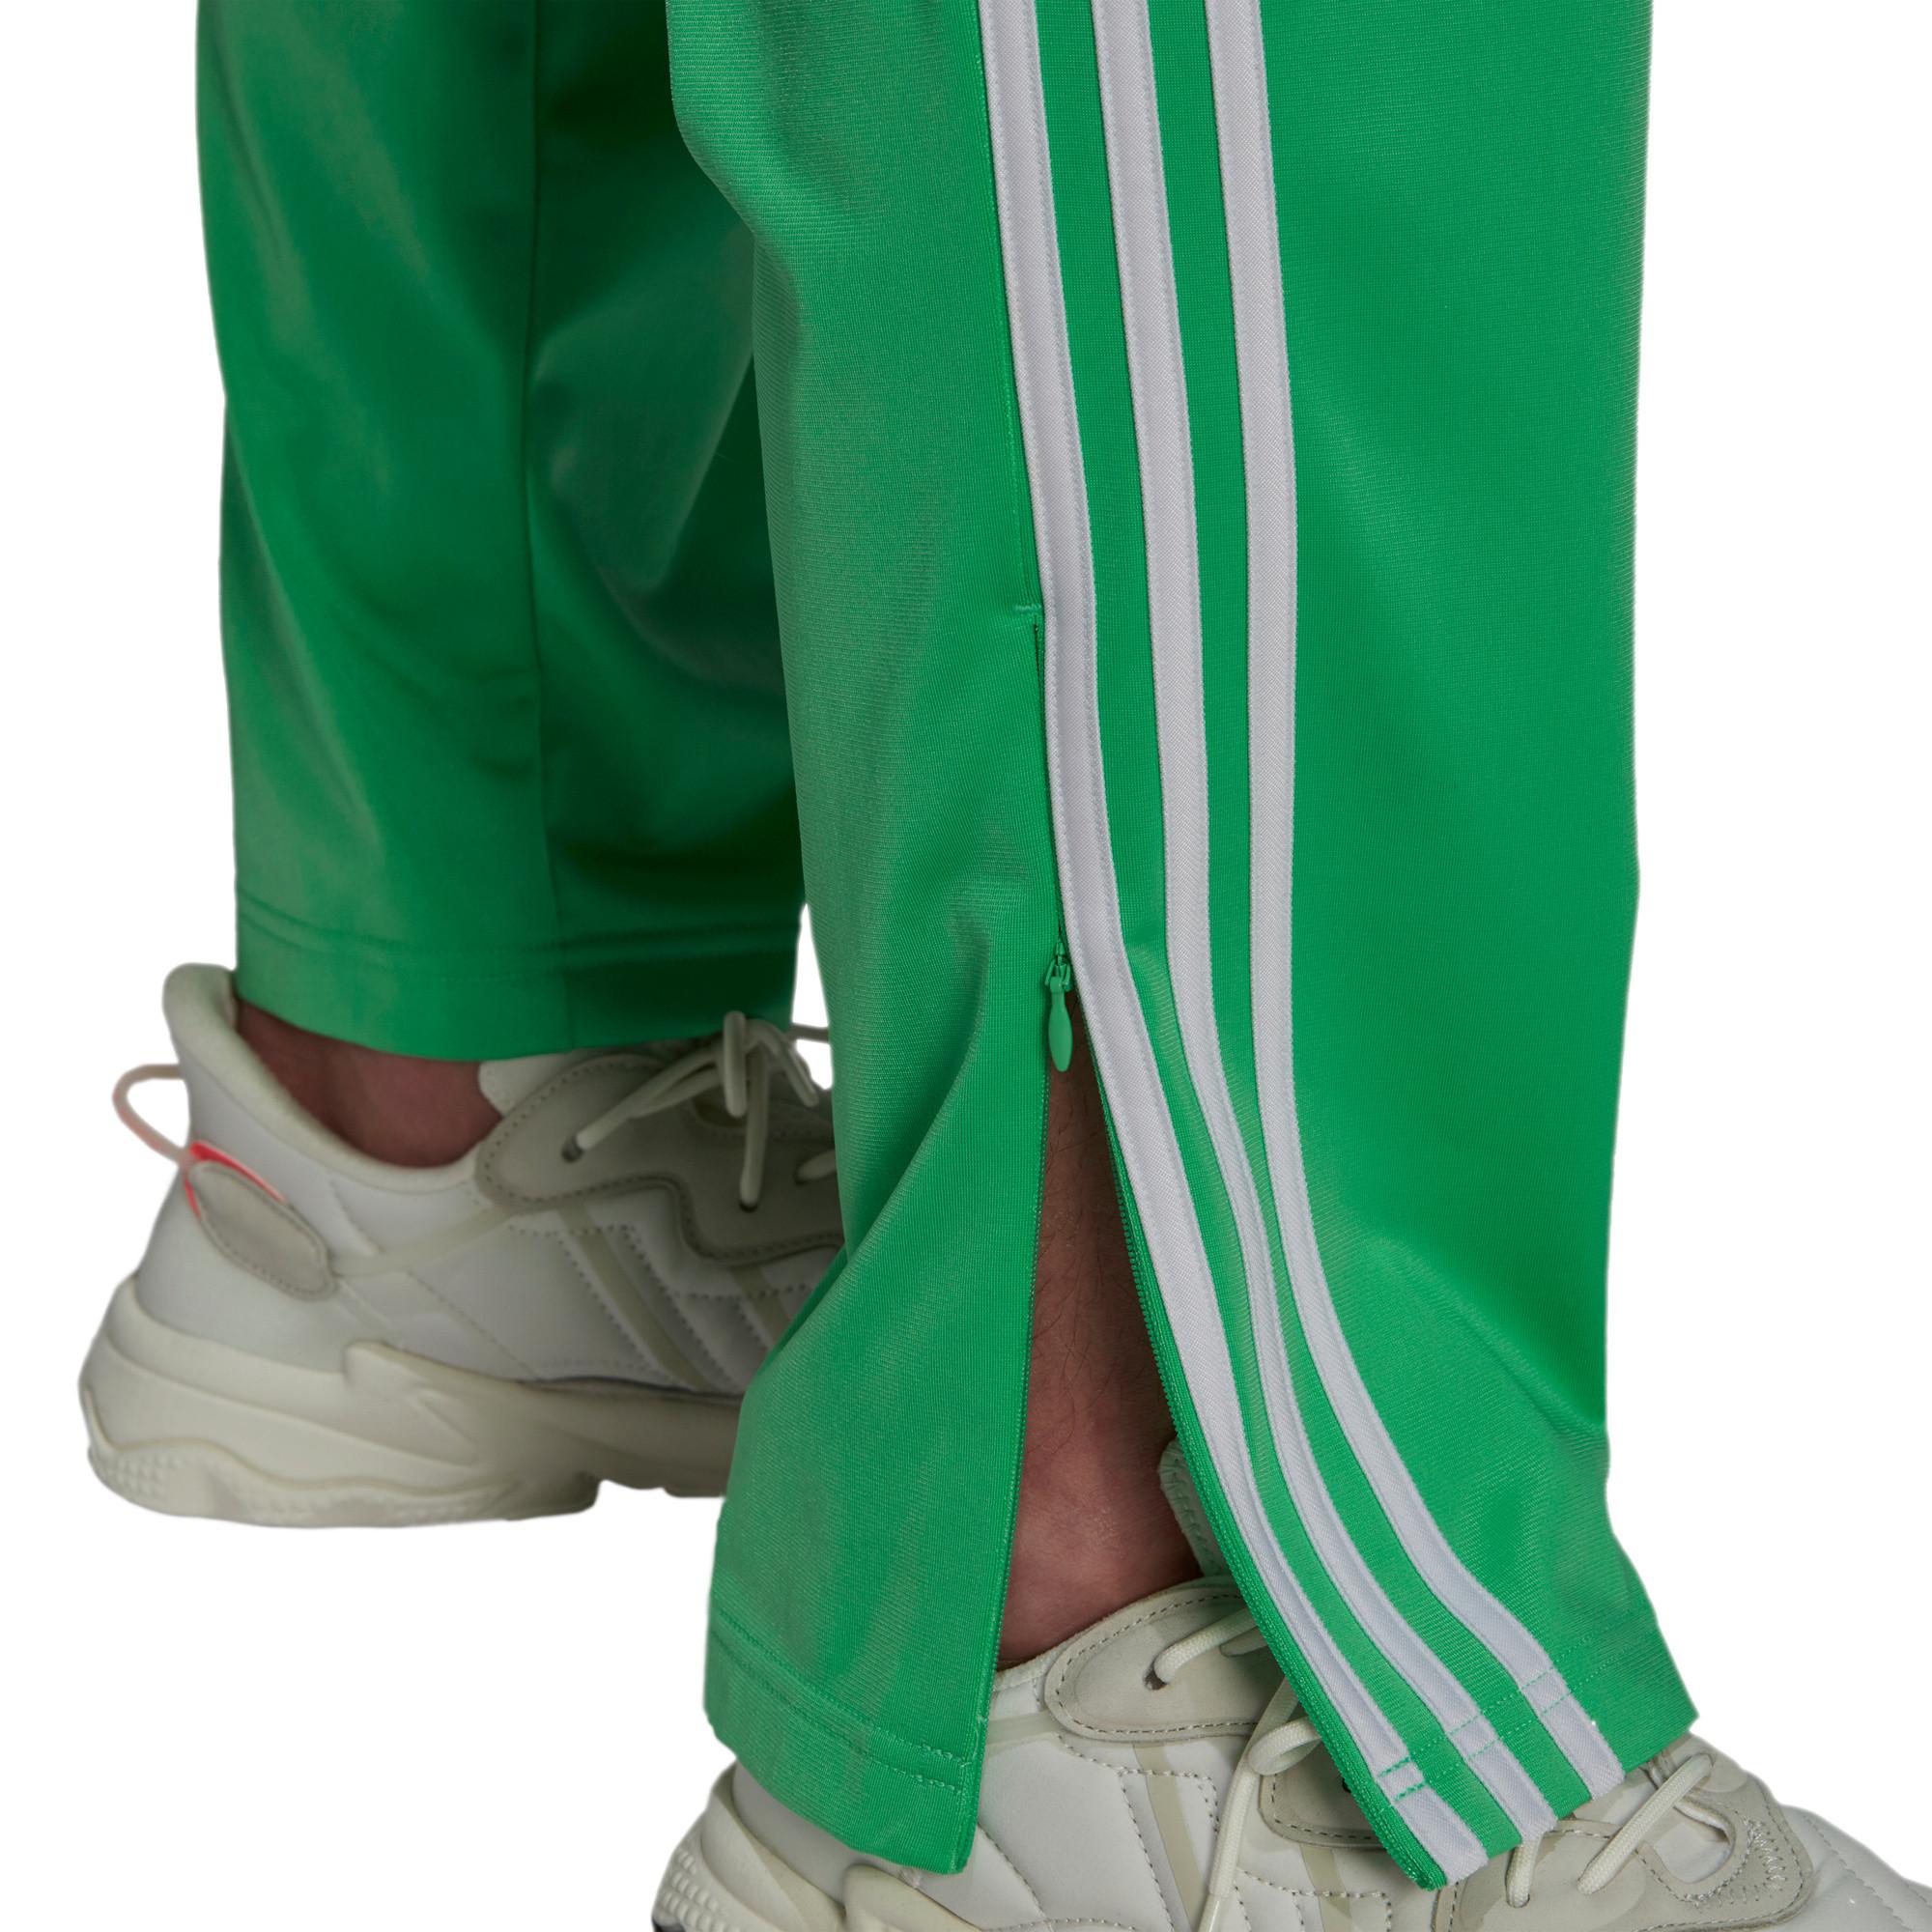 Pantaloni tuta uomo adicolor Classics Firebird Primeblue, Verde, large image number 2